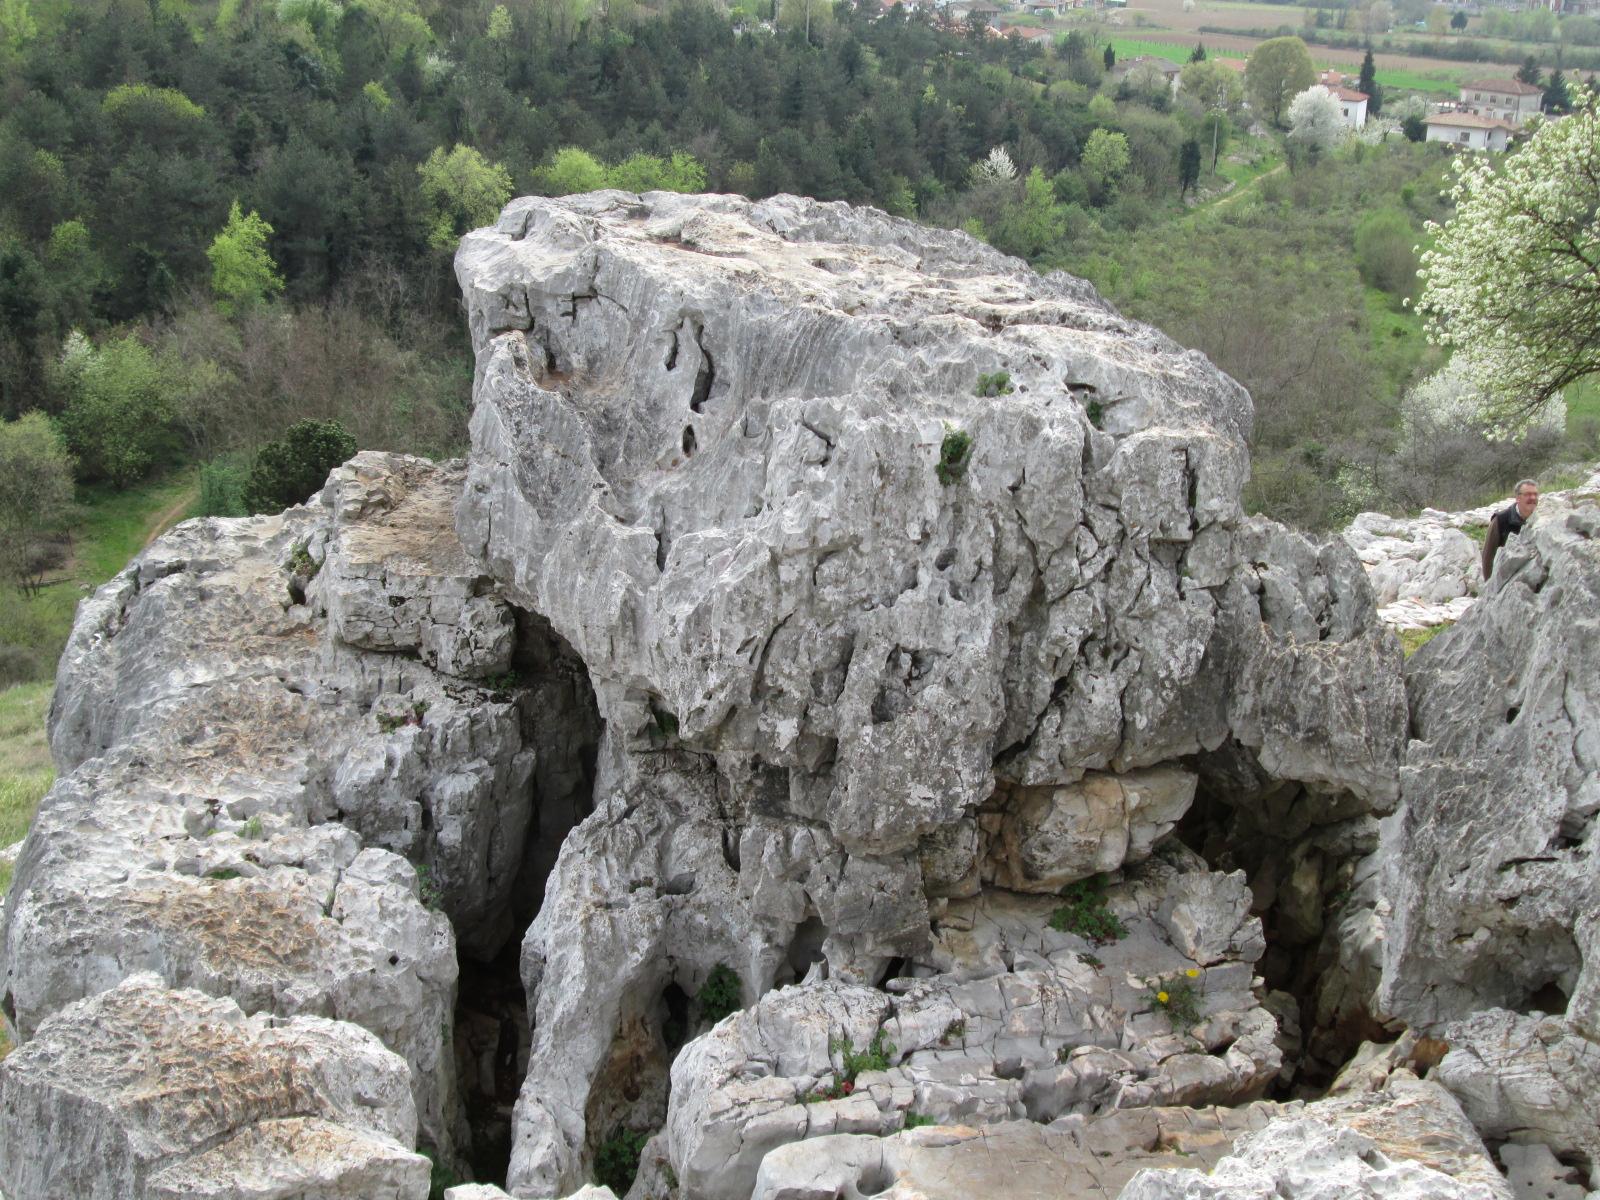 Sas De San Belin analisi geobiologica 0816